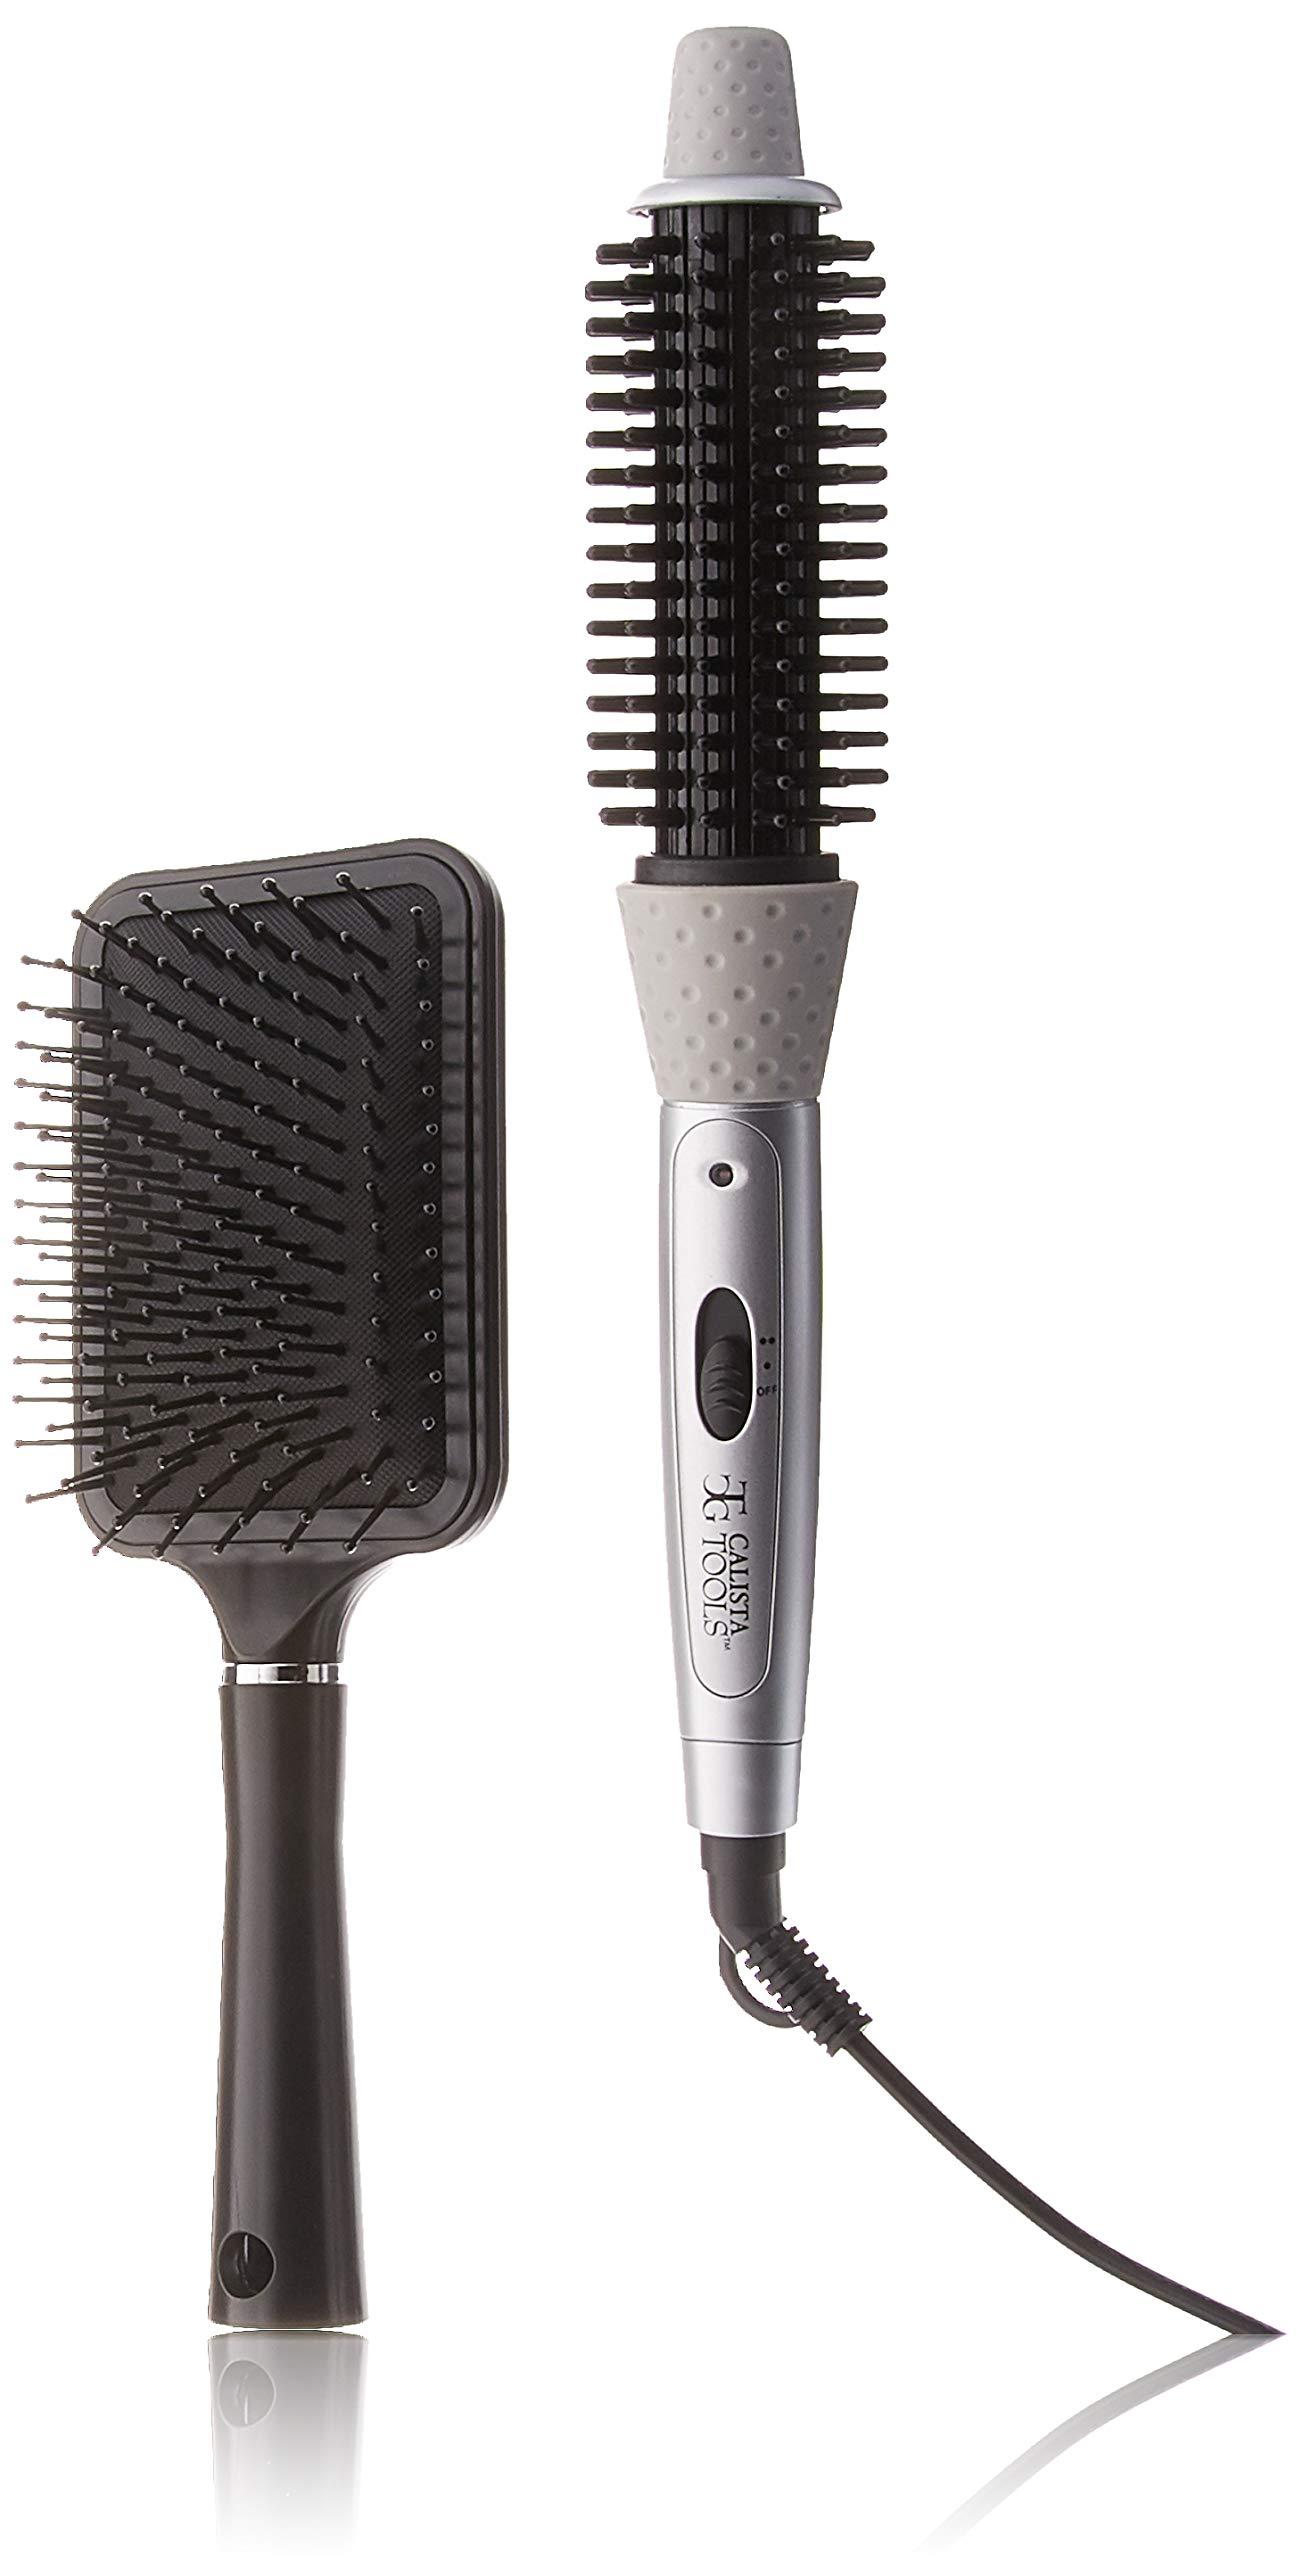 calista perfecter fusion hair styler hot air brush - 71X CwUVaAL - Calista Perfecter Fusion Hair Styler Hot Air Brush Plus Bonuses